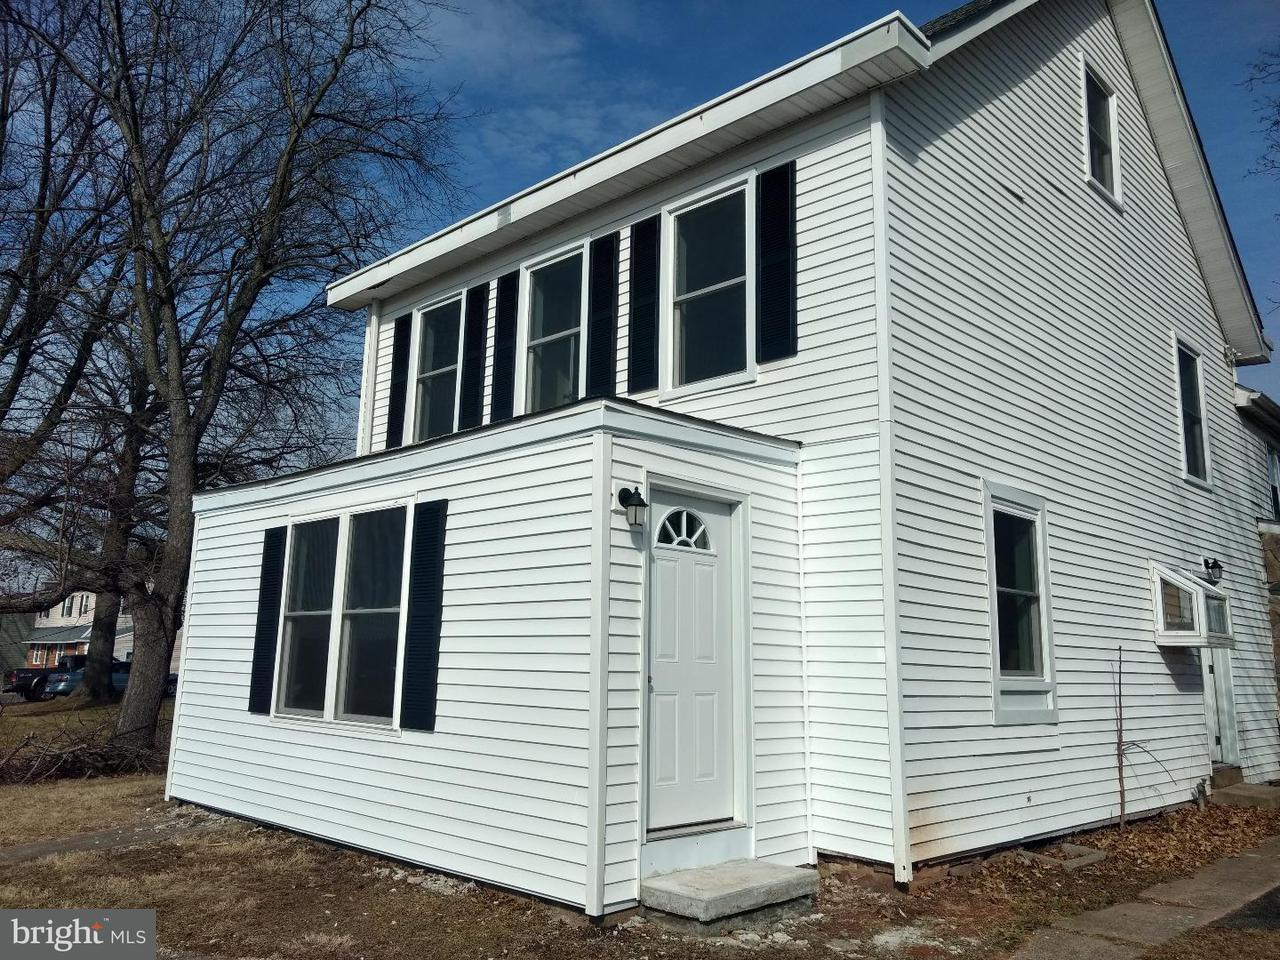 Casa unifamiliar adosada (Townhouse) por un Alquiler en 910 MONTGOMERY AVE #A Pennsburg, Pennsylvania 18073 Estados Unidos